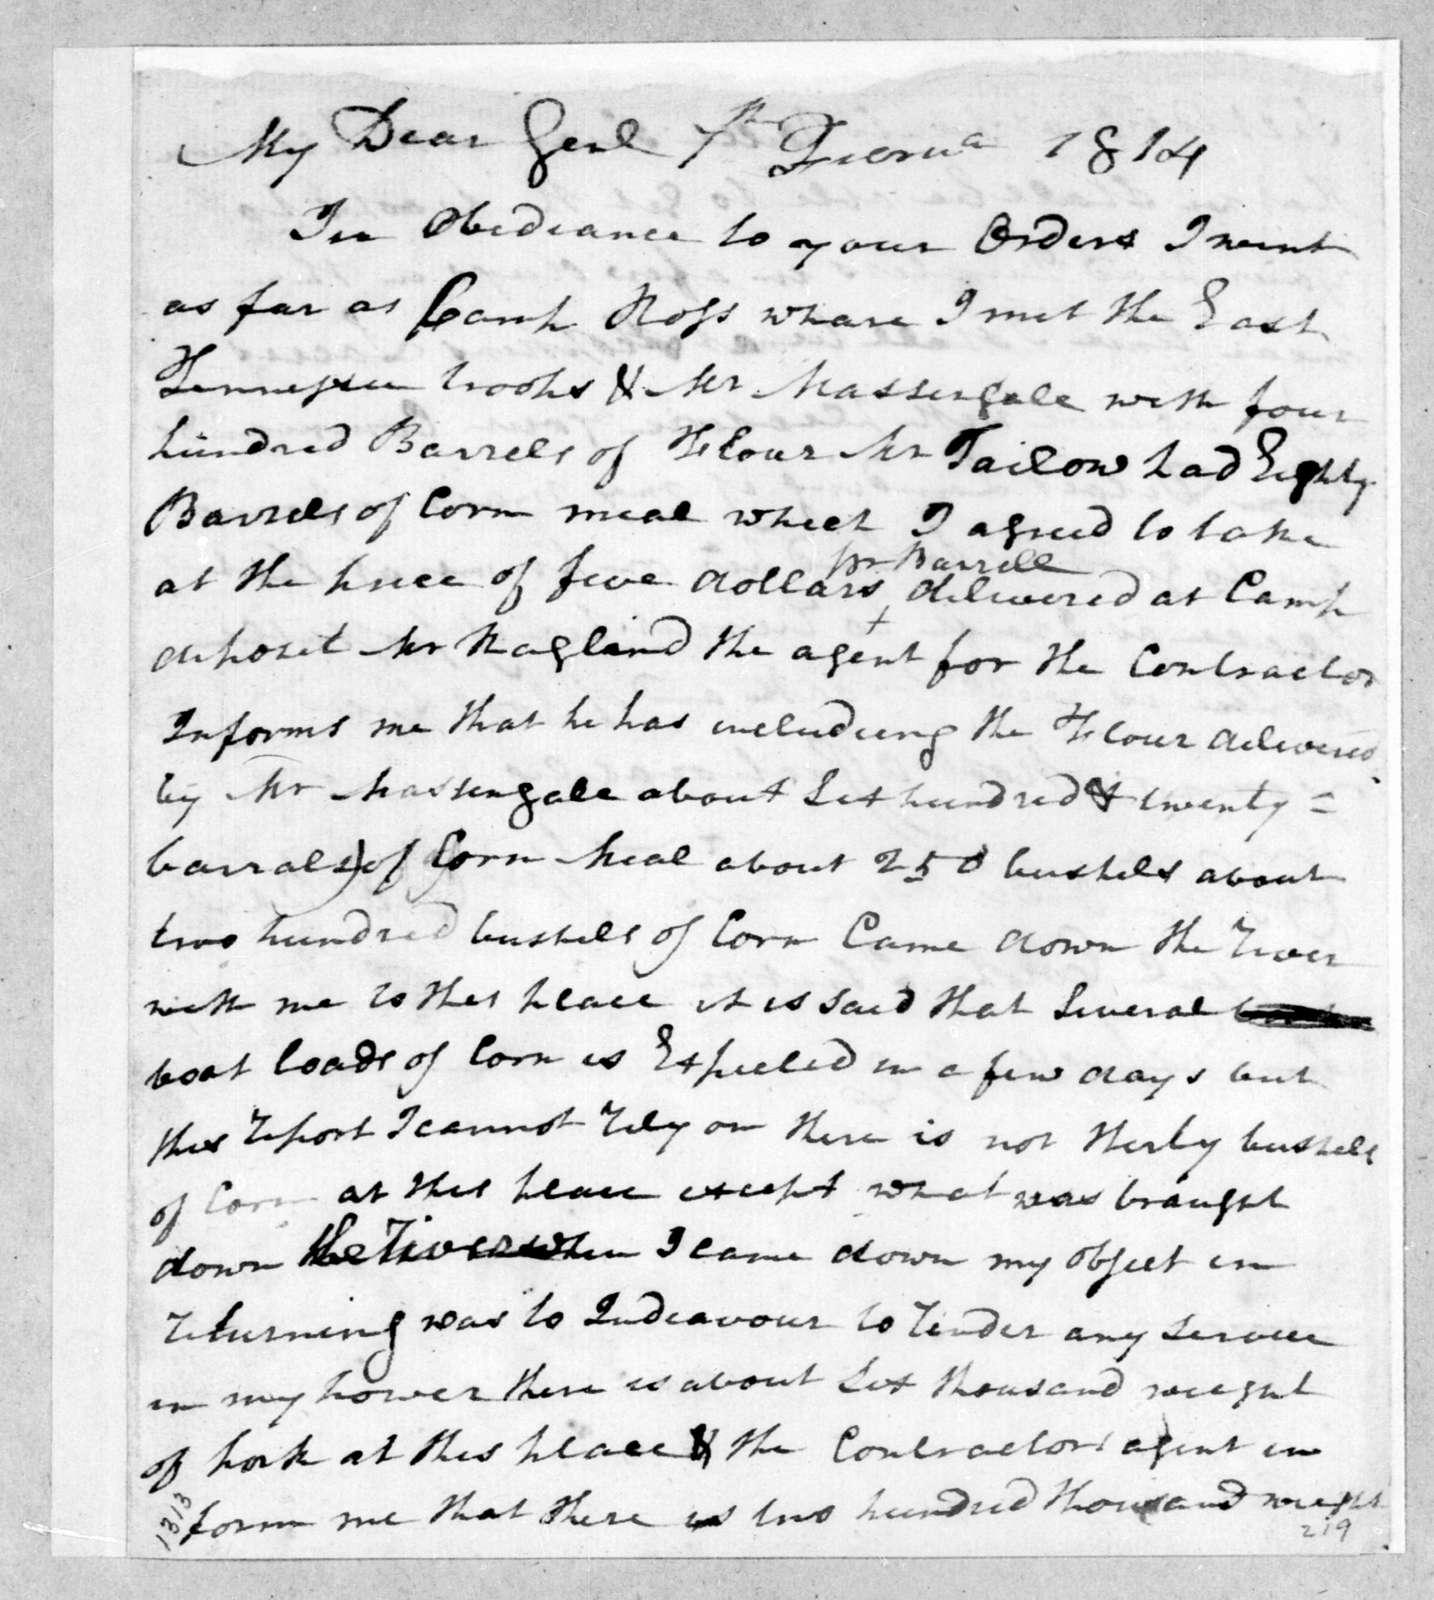 William Cocke to Andrew Jackson, February 7, 1814